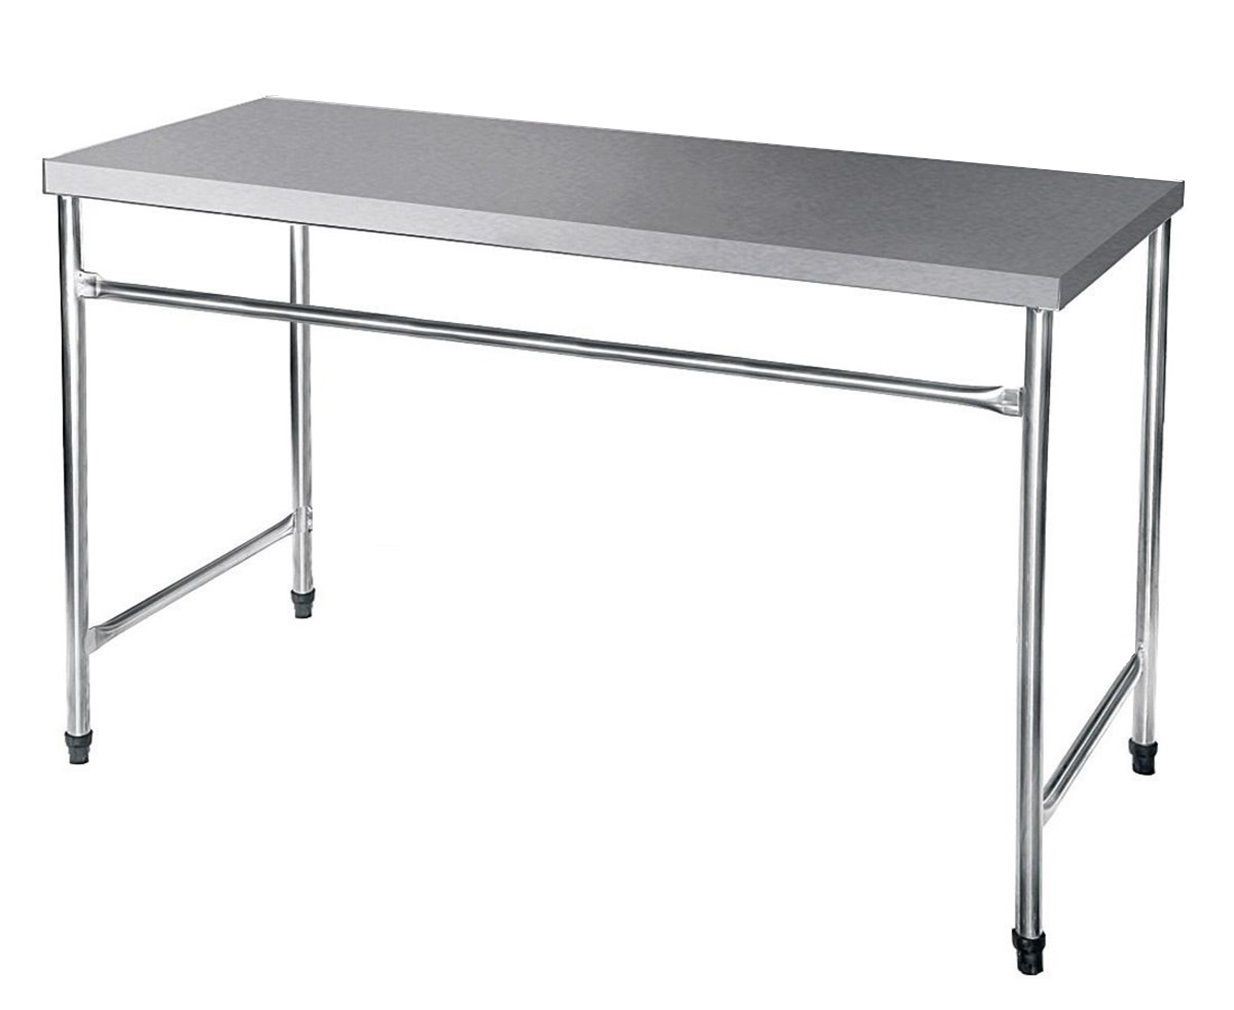 Bancada / Mesa Em Aço Inox (120x60x85)